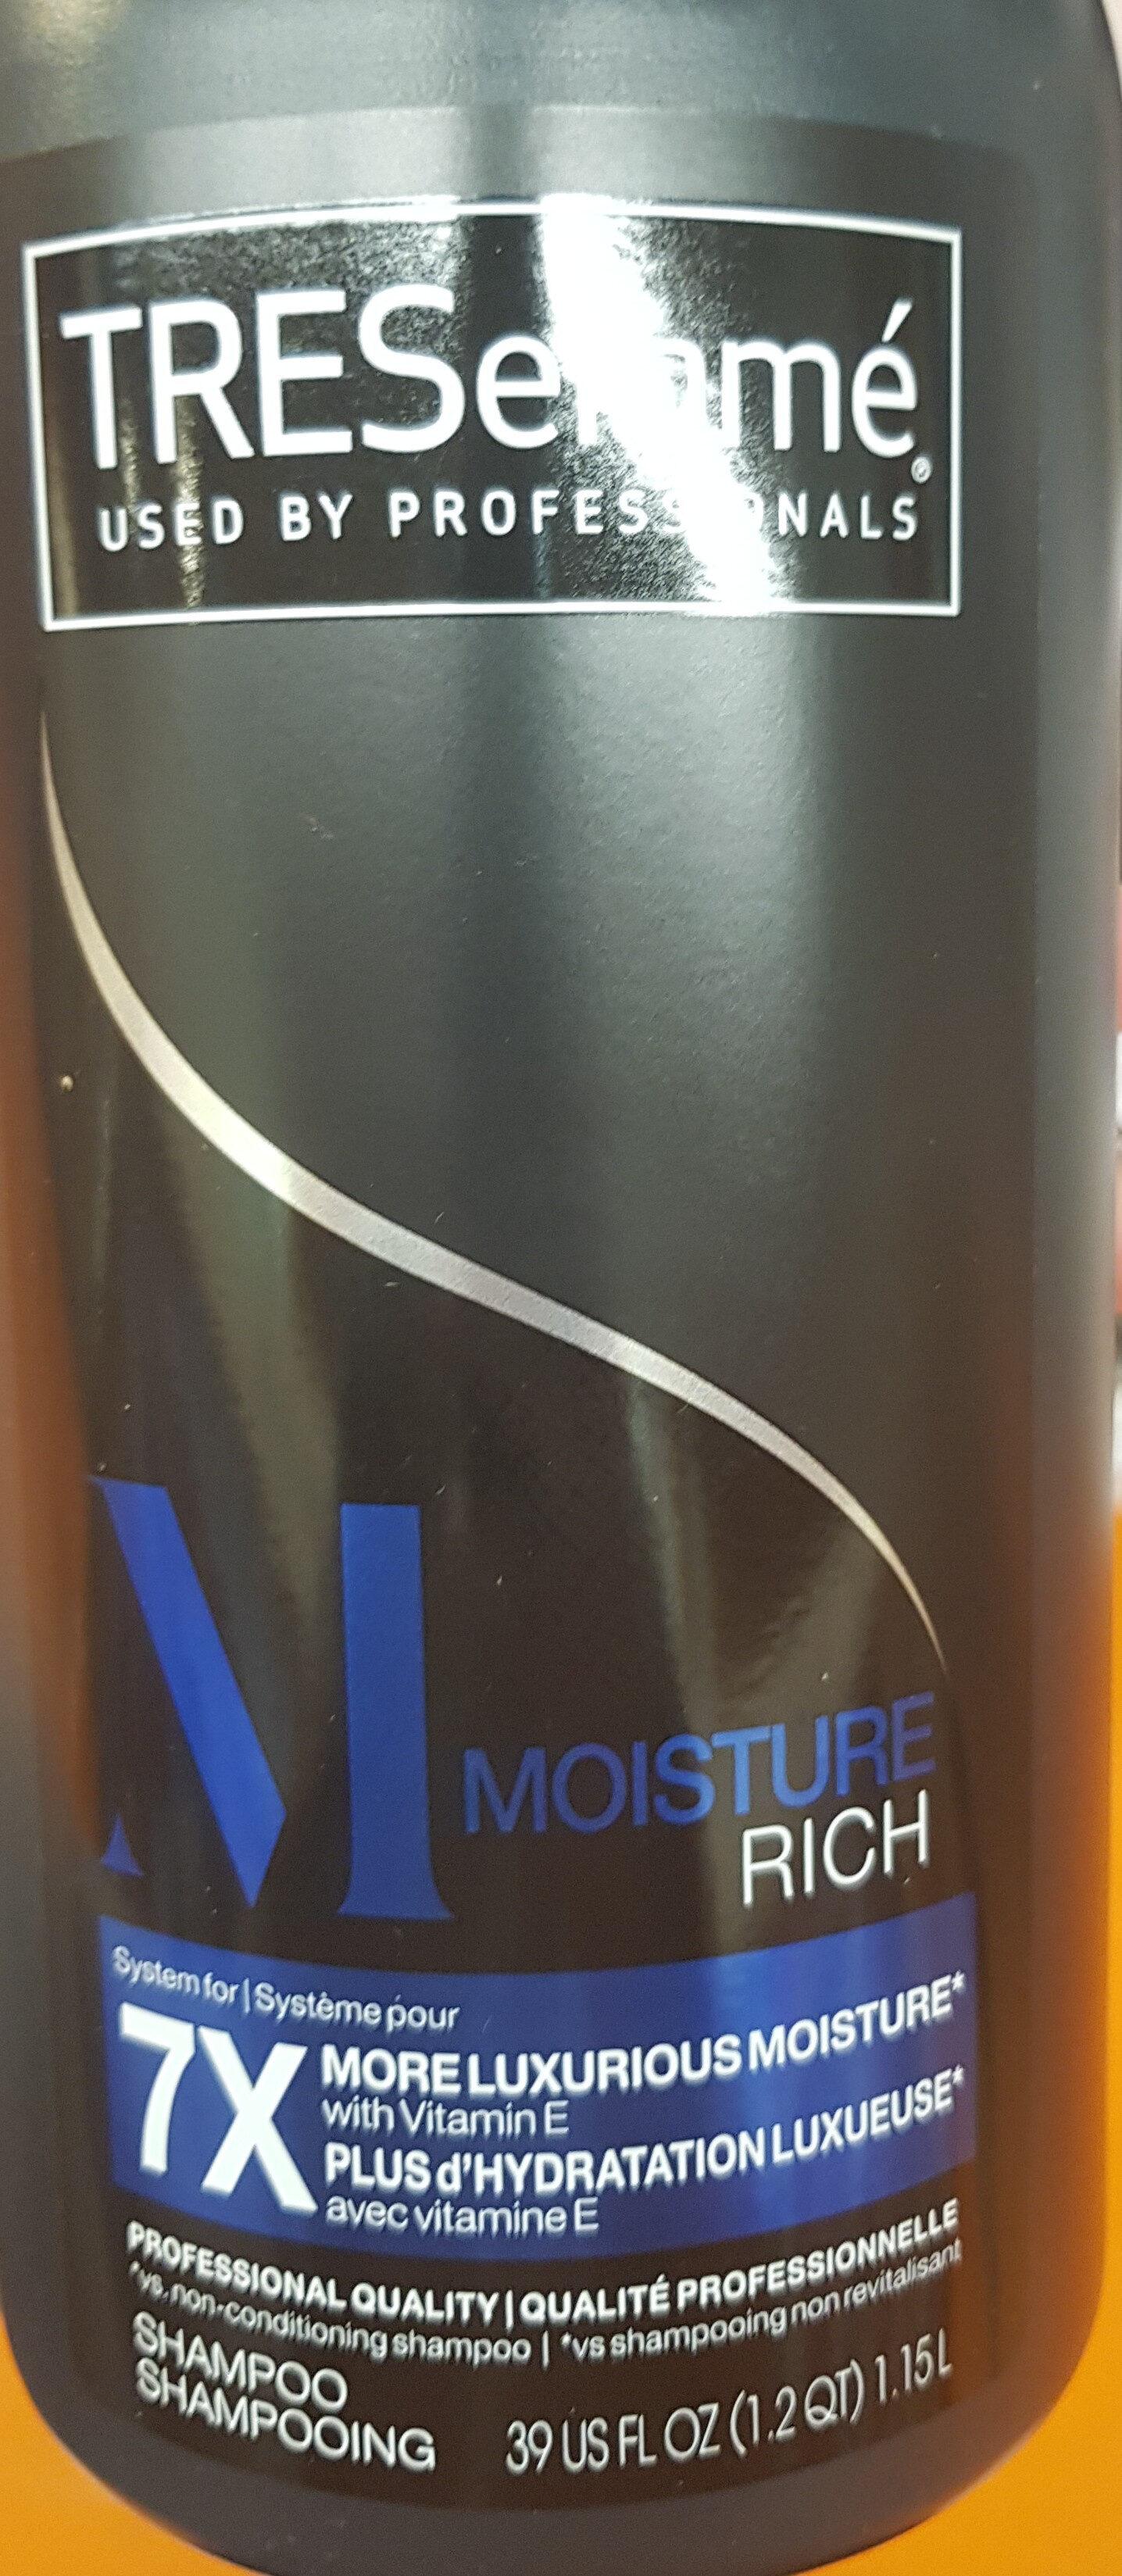 Tresemee Moisture Rich - Produit - en